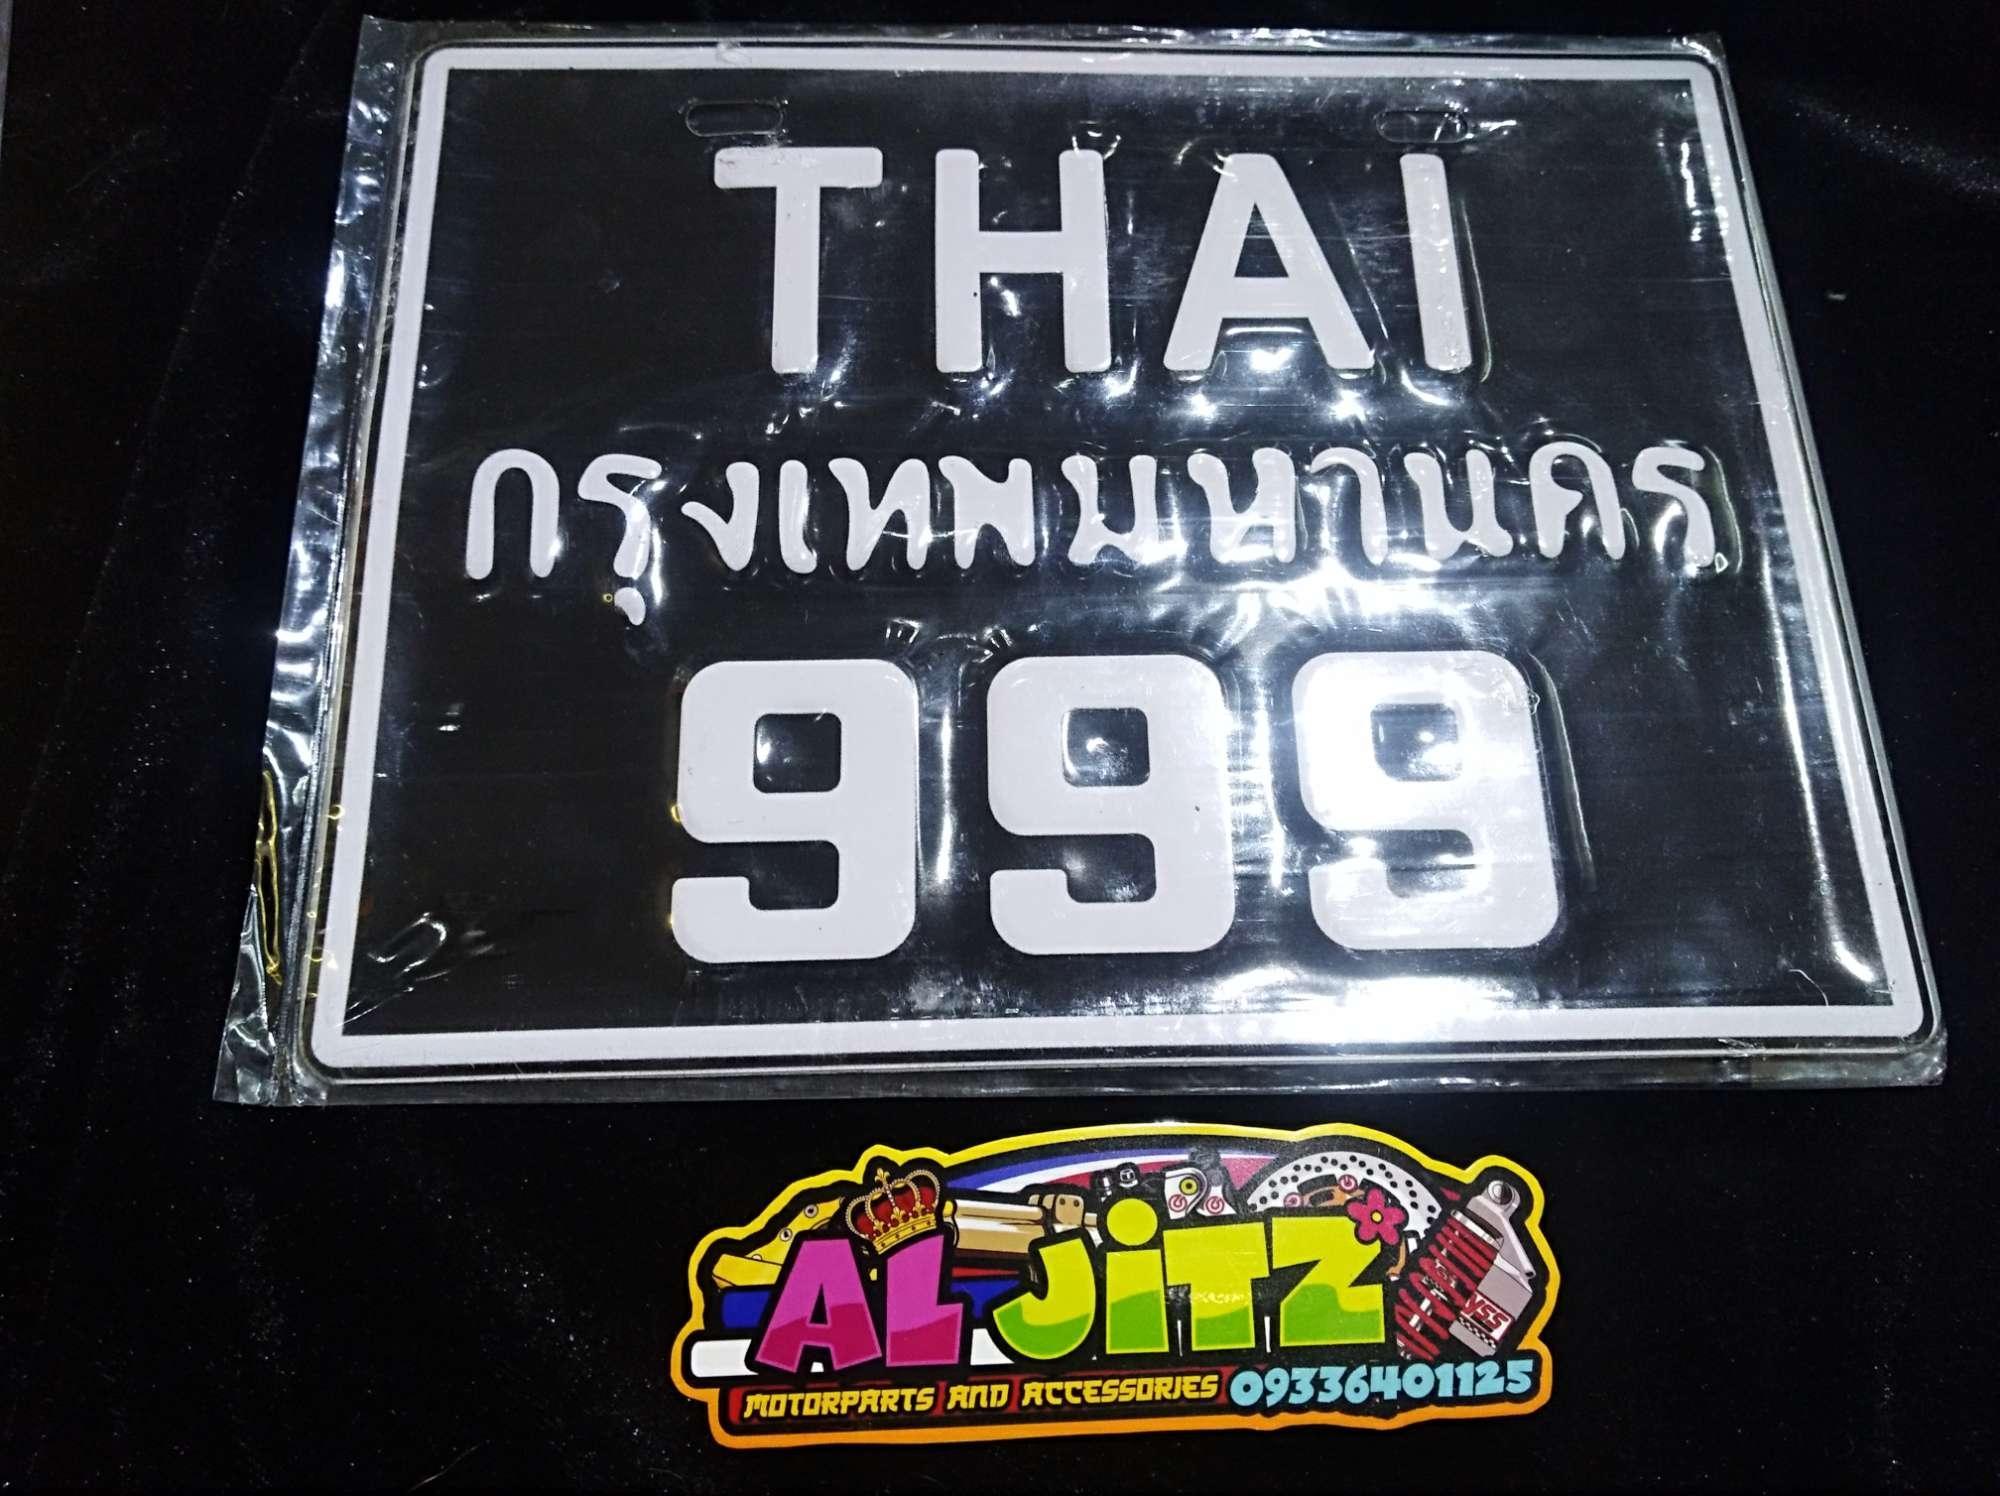 Thai Plate (black 999) By Jitz Motorcycle Shop.